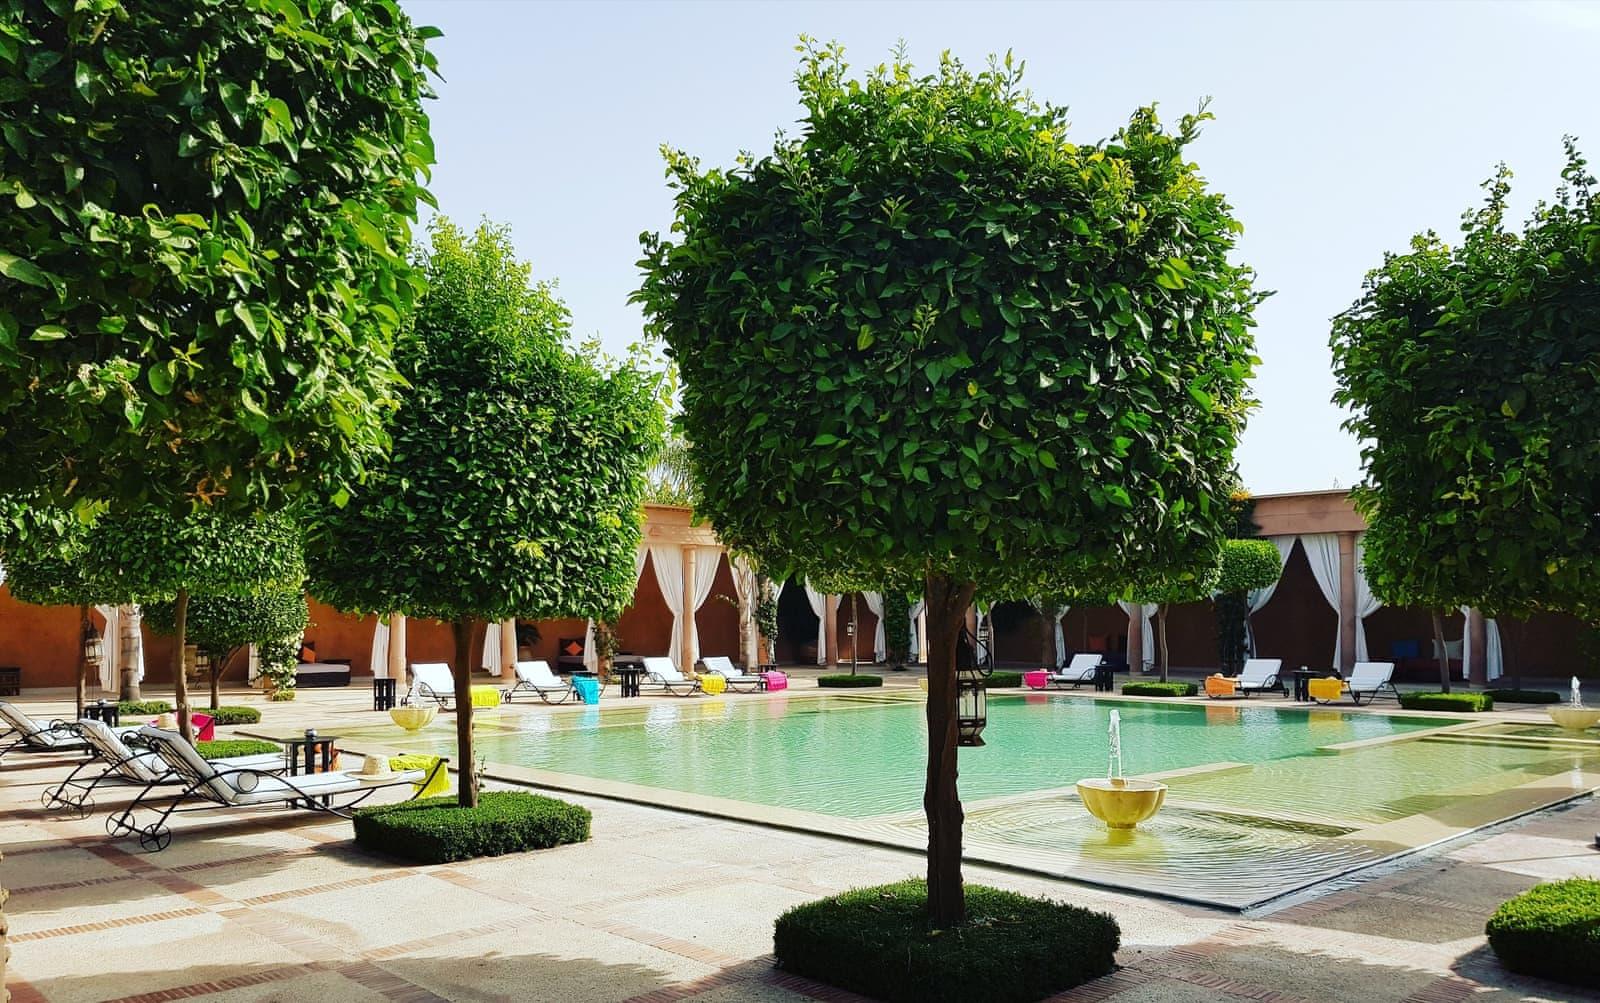 Les Jardins de Touhina Al Ouidane, Marrakech